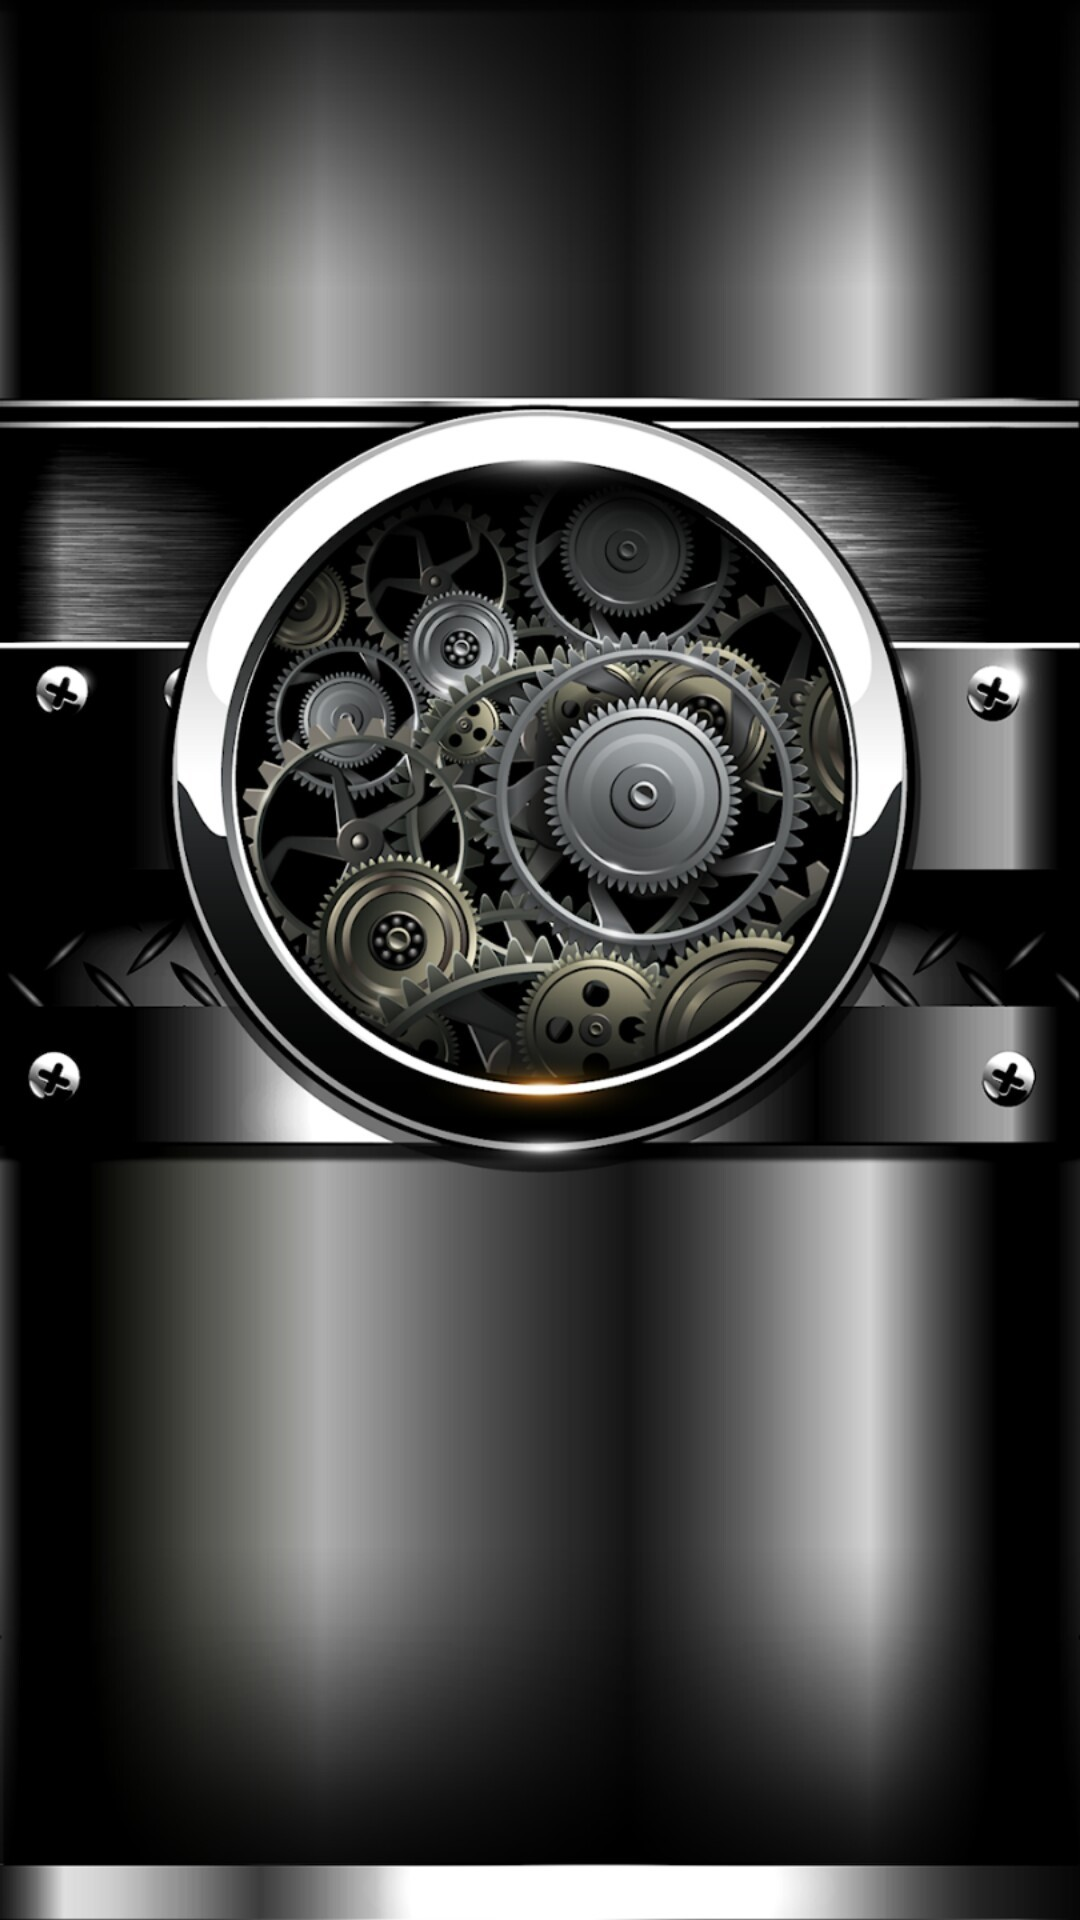 Screen Wallpaper, Black Wallpaper, Phone Backgrounds, Phone Wallpapers,  Smartphone, Glitter, Walls, Black, Screen